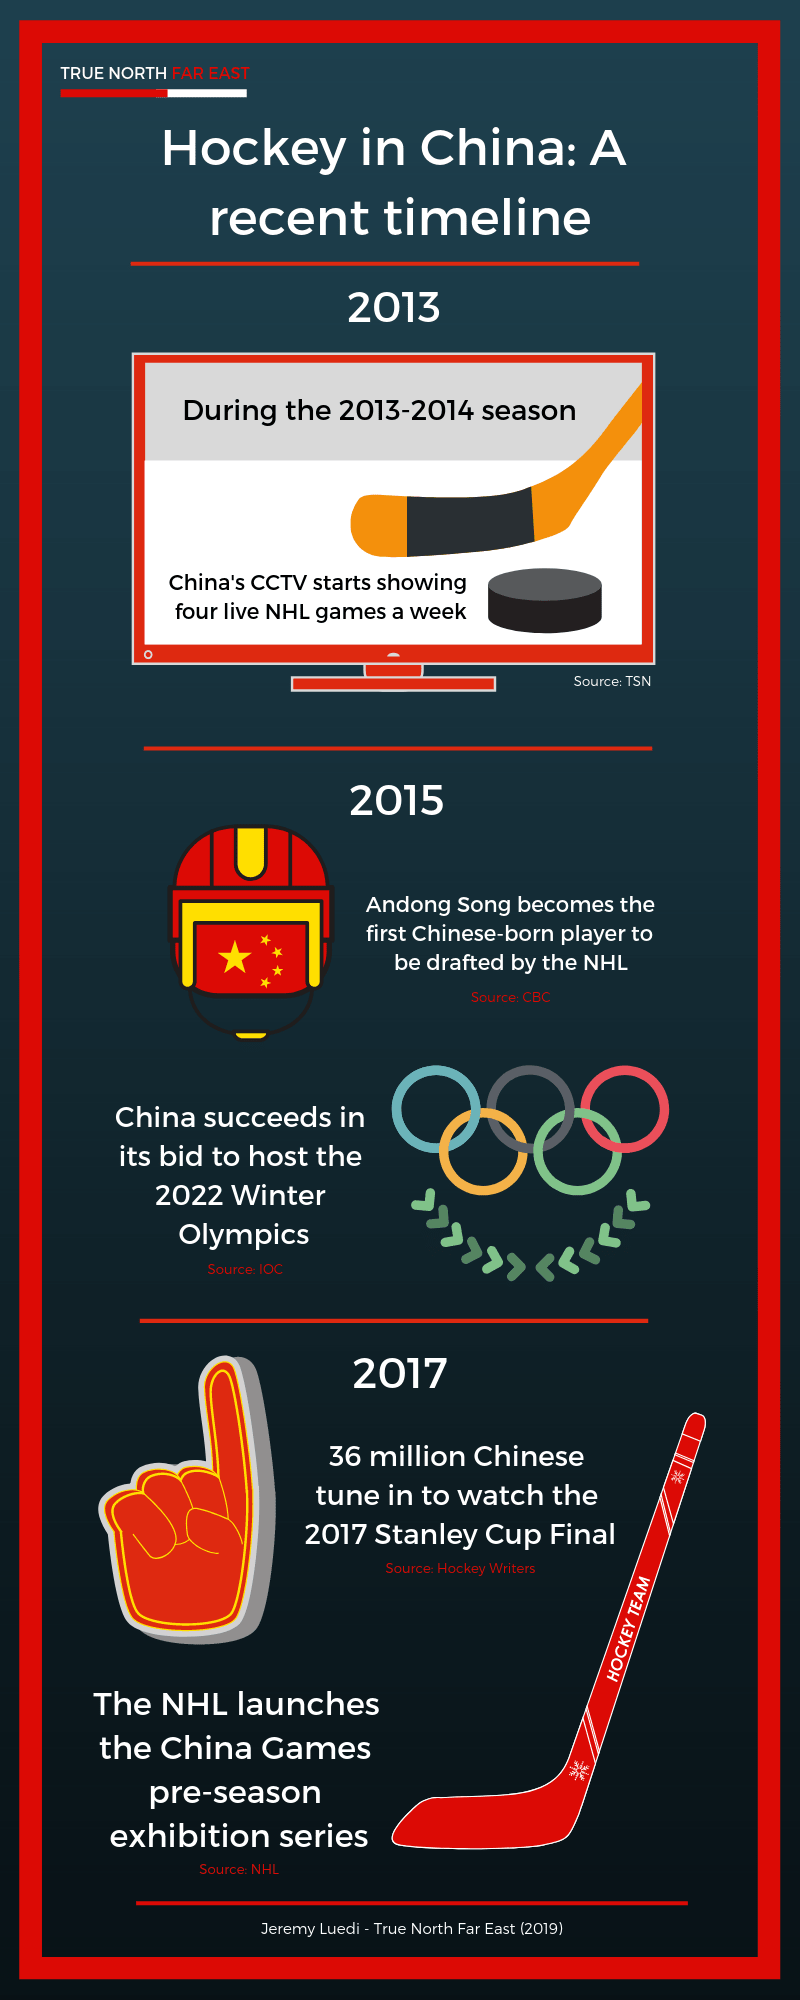 hockey-in-china-timeline-2013-2017